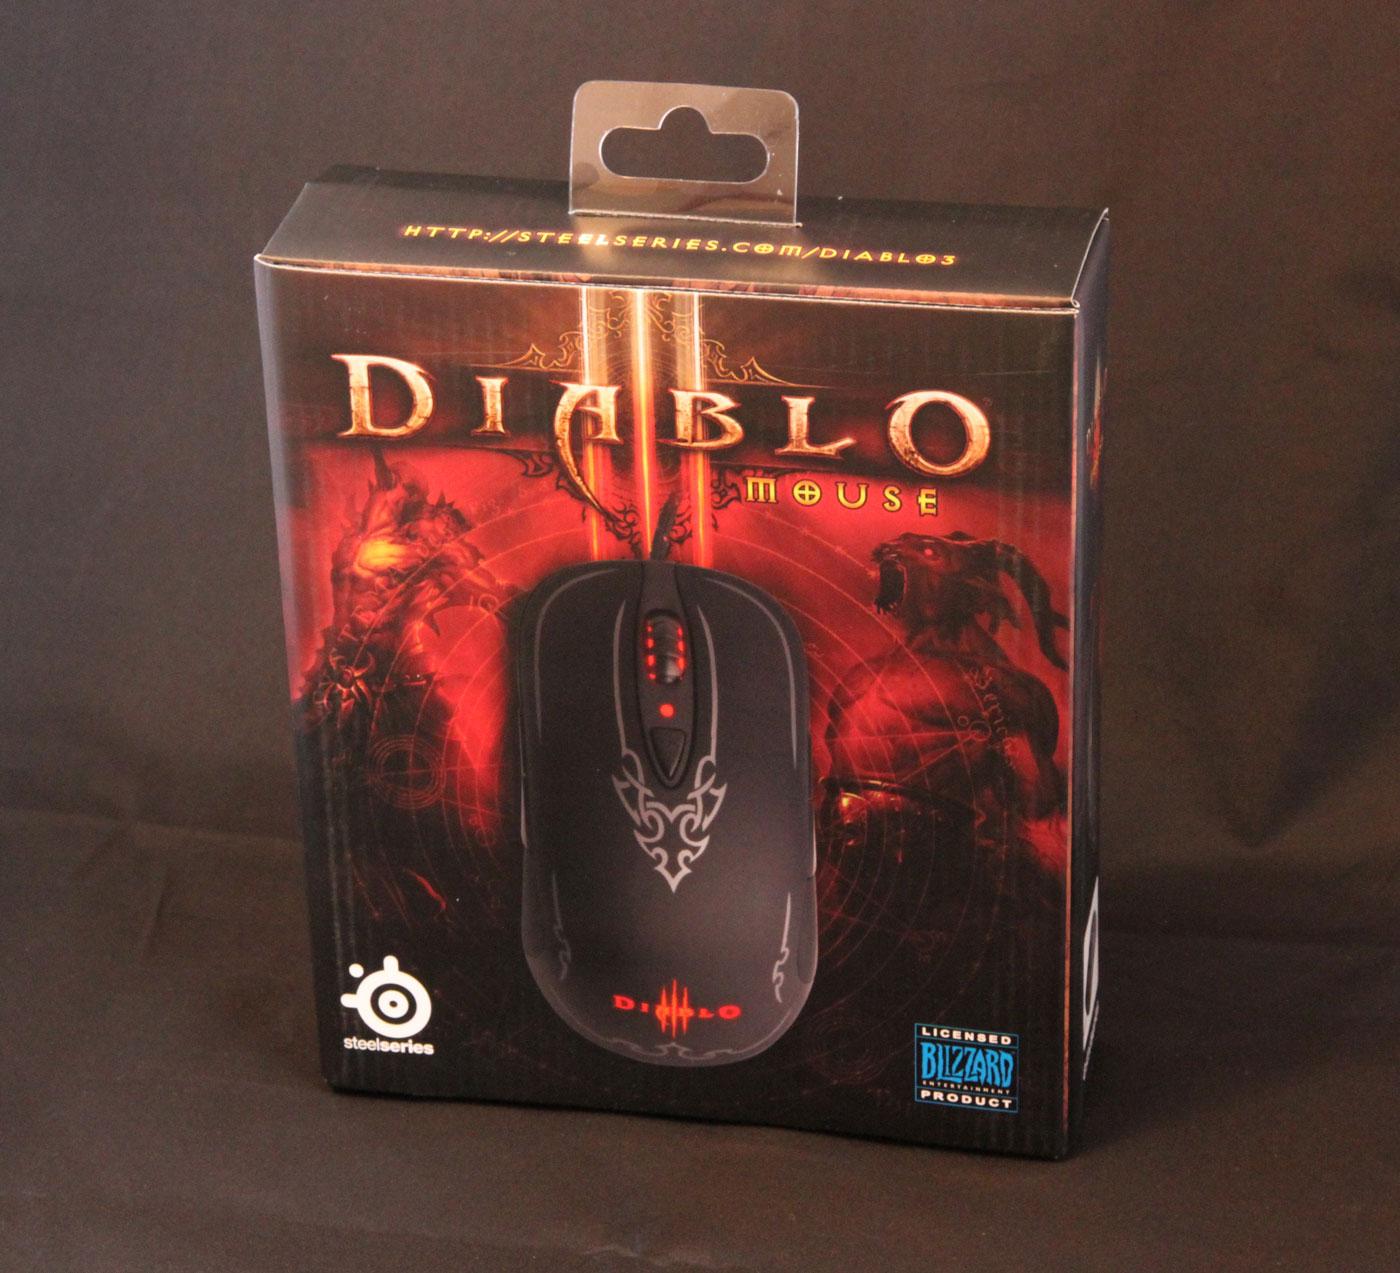 Souris Steelseries Diablo III.